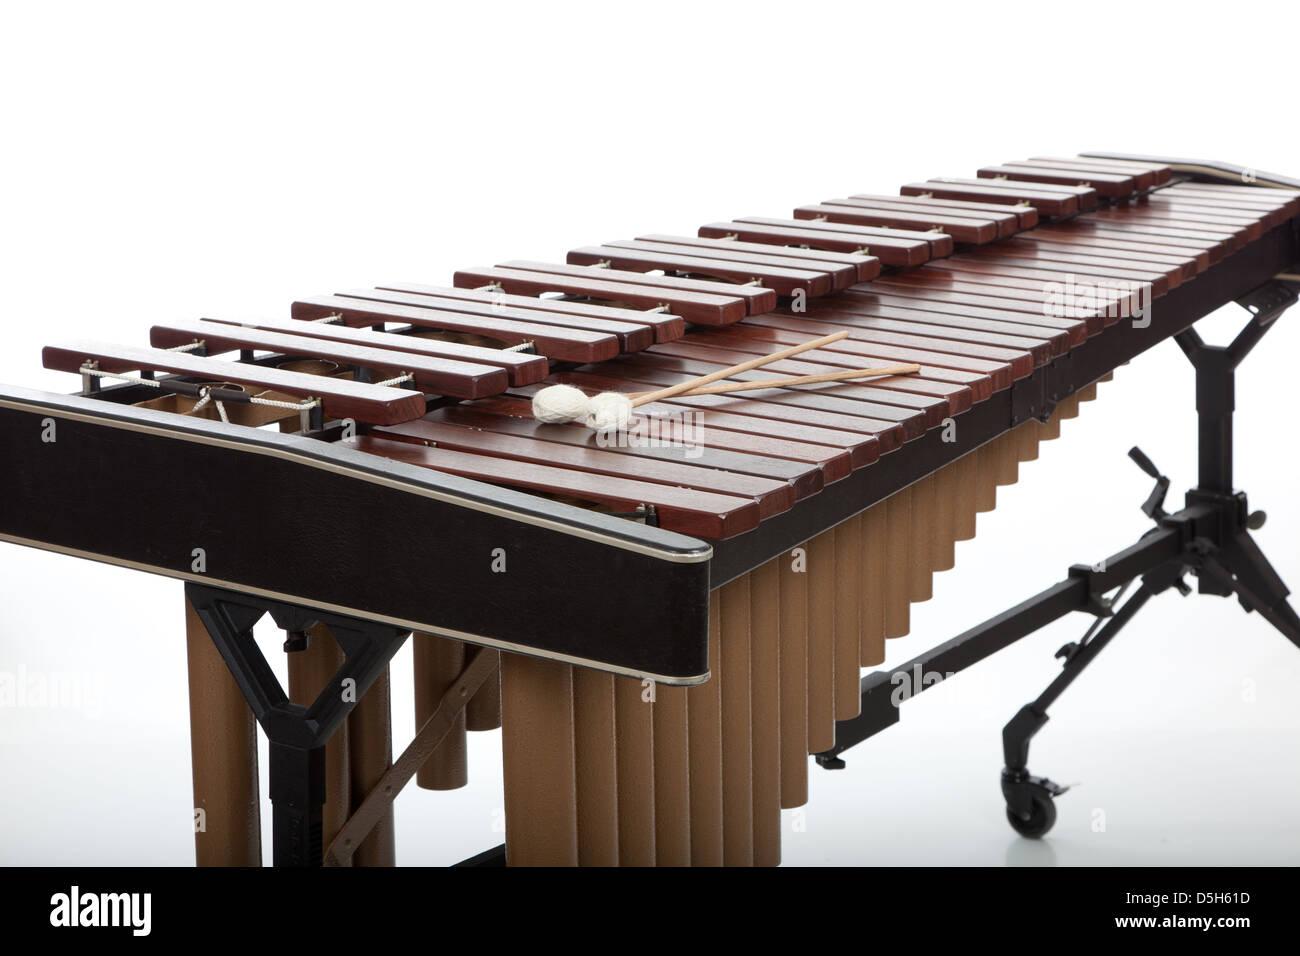 Xylophone Stock Photos & Xylophone Stock Images - Alamy